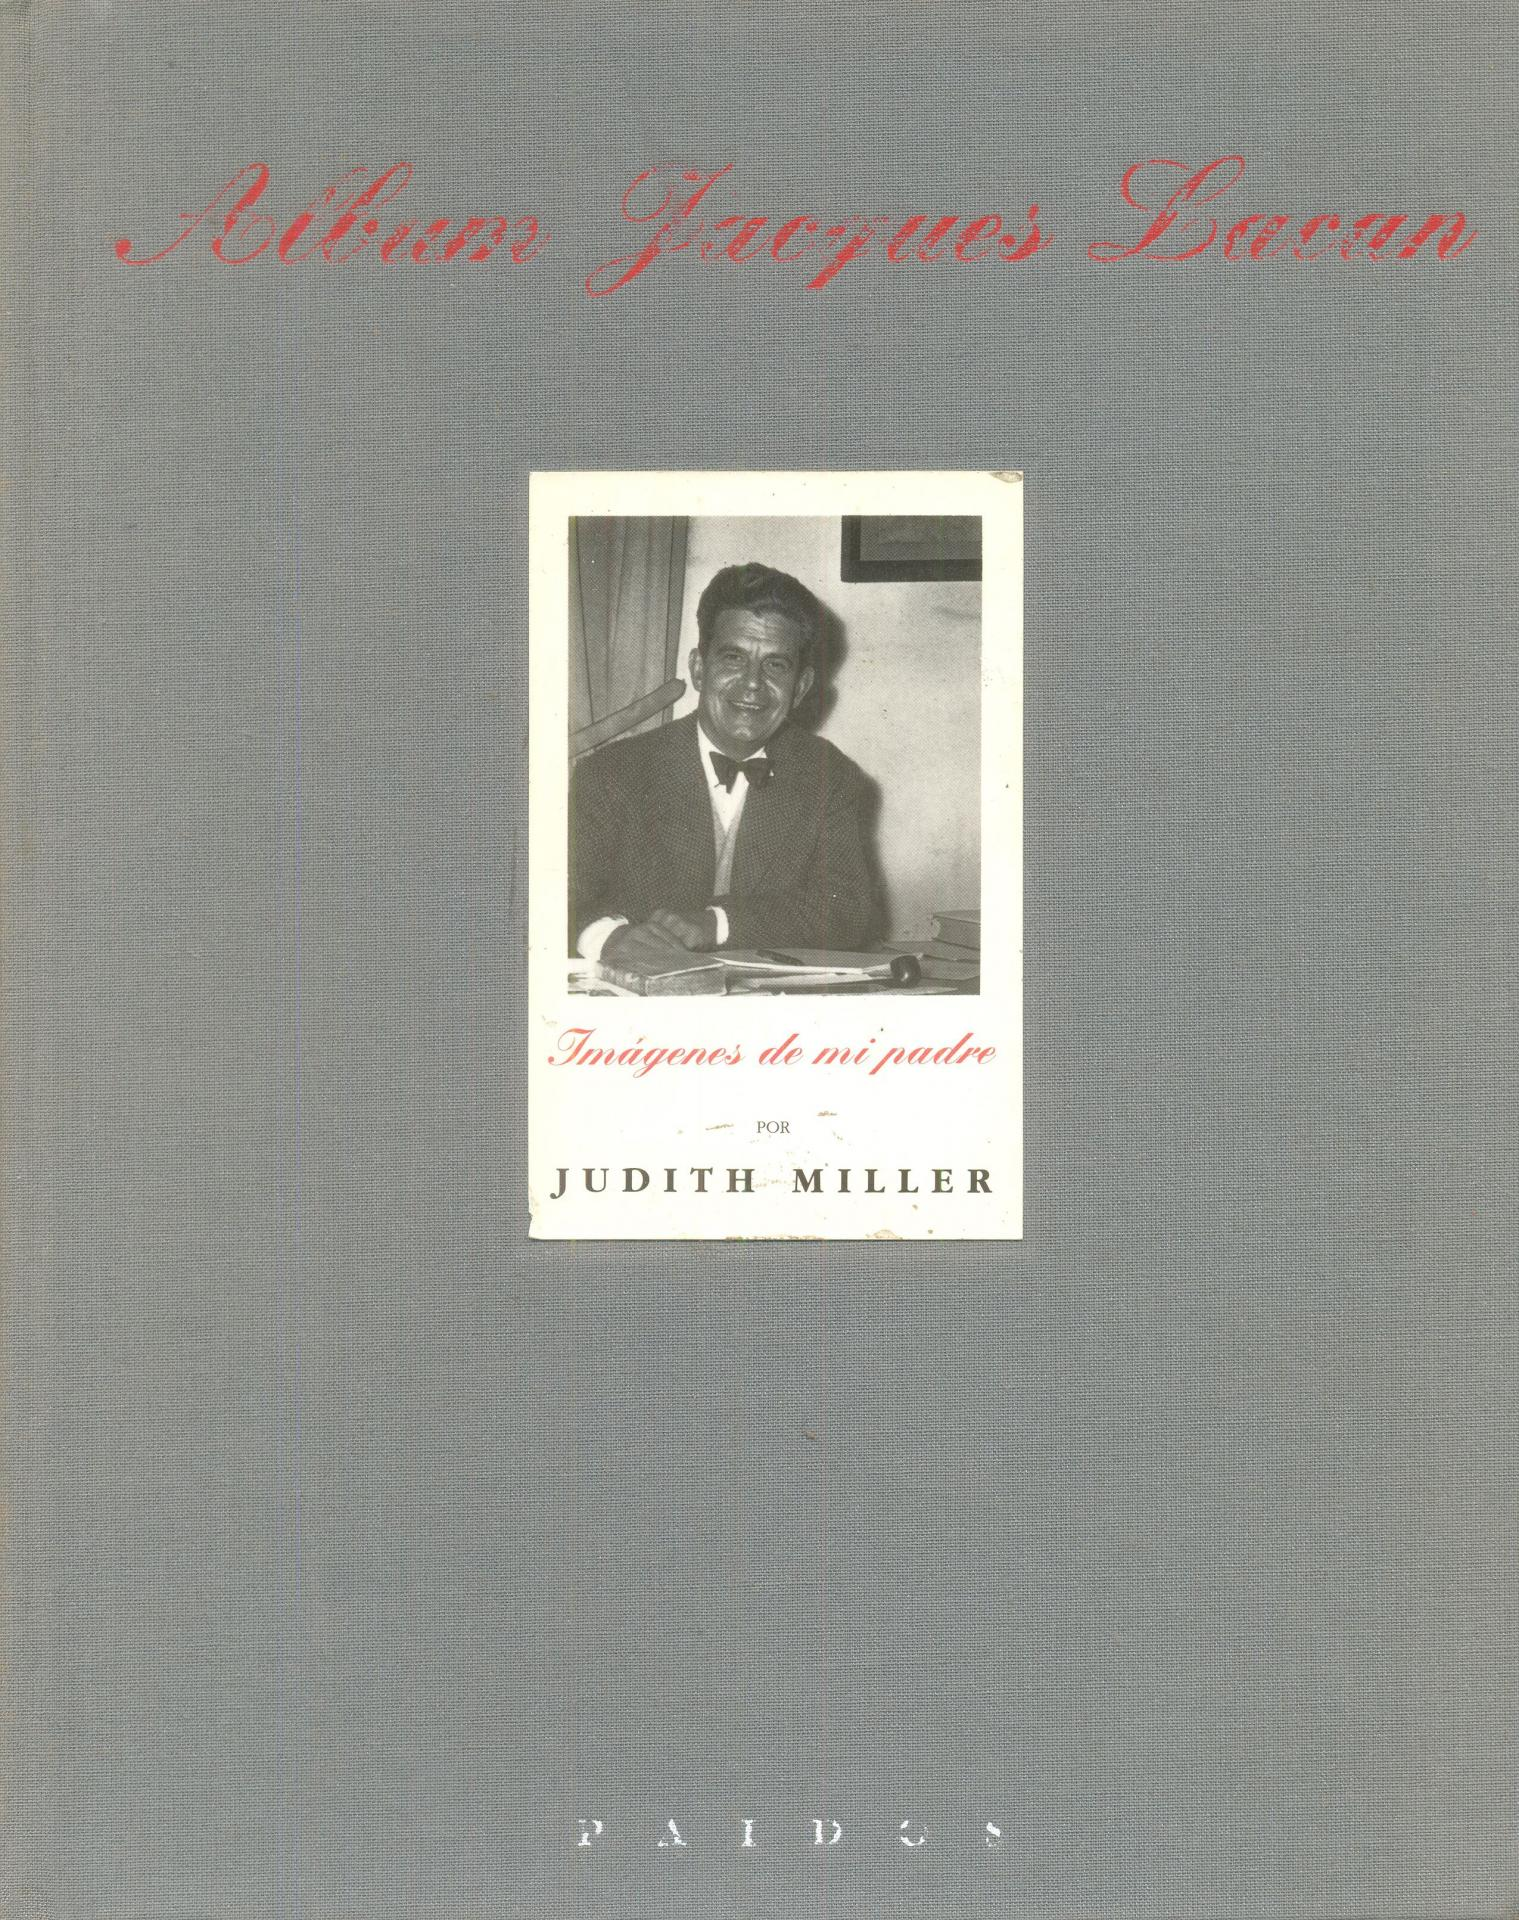 ALBUM JACQUES LACAN. Imágenes de mi padre por Judith Miller.